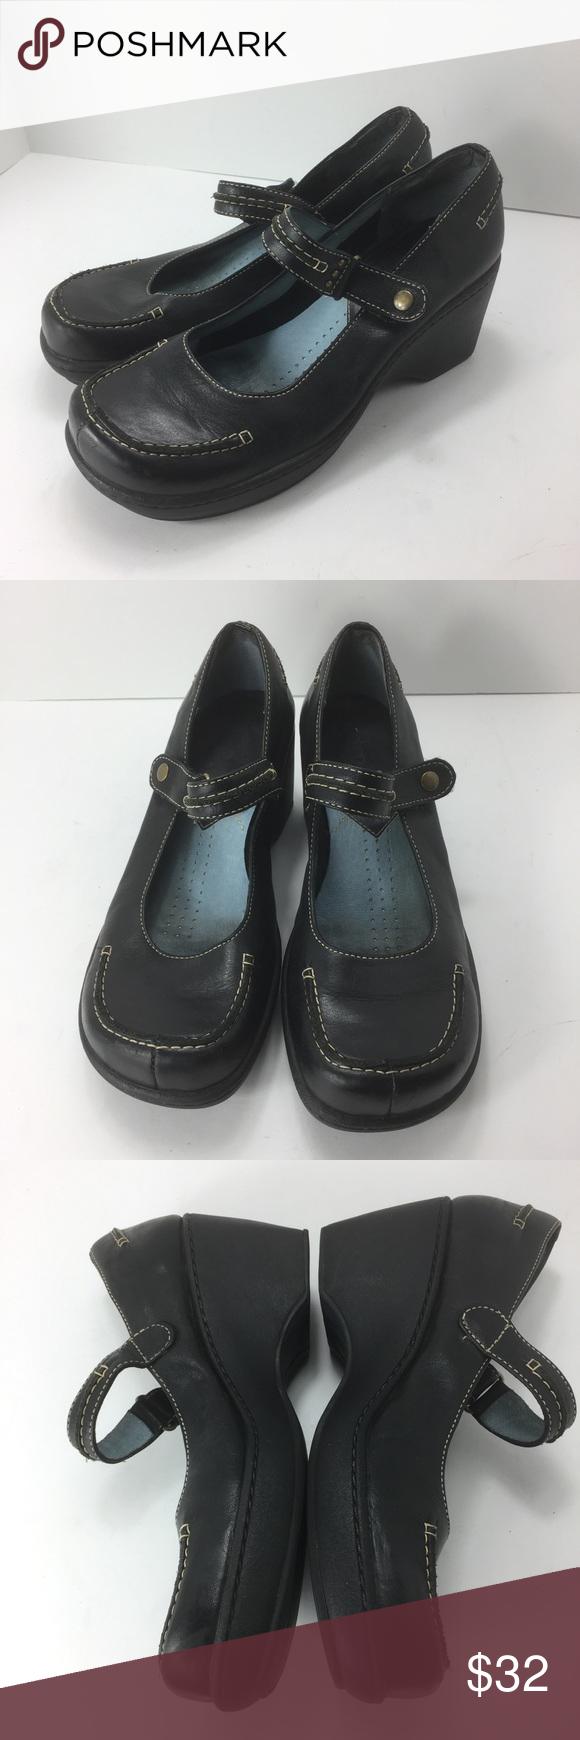 Indigo By Clarks Leather Mary Jane Shoes 7 1/2 M Indigo By Clarks Womens